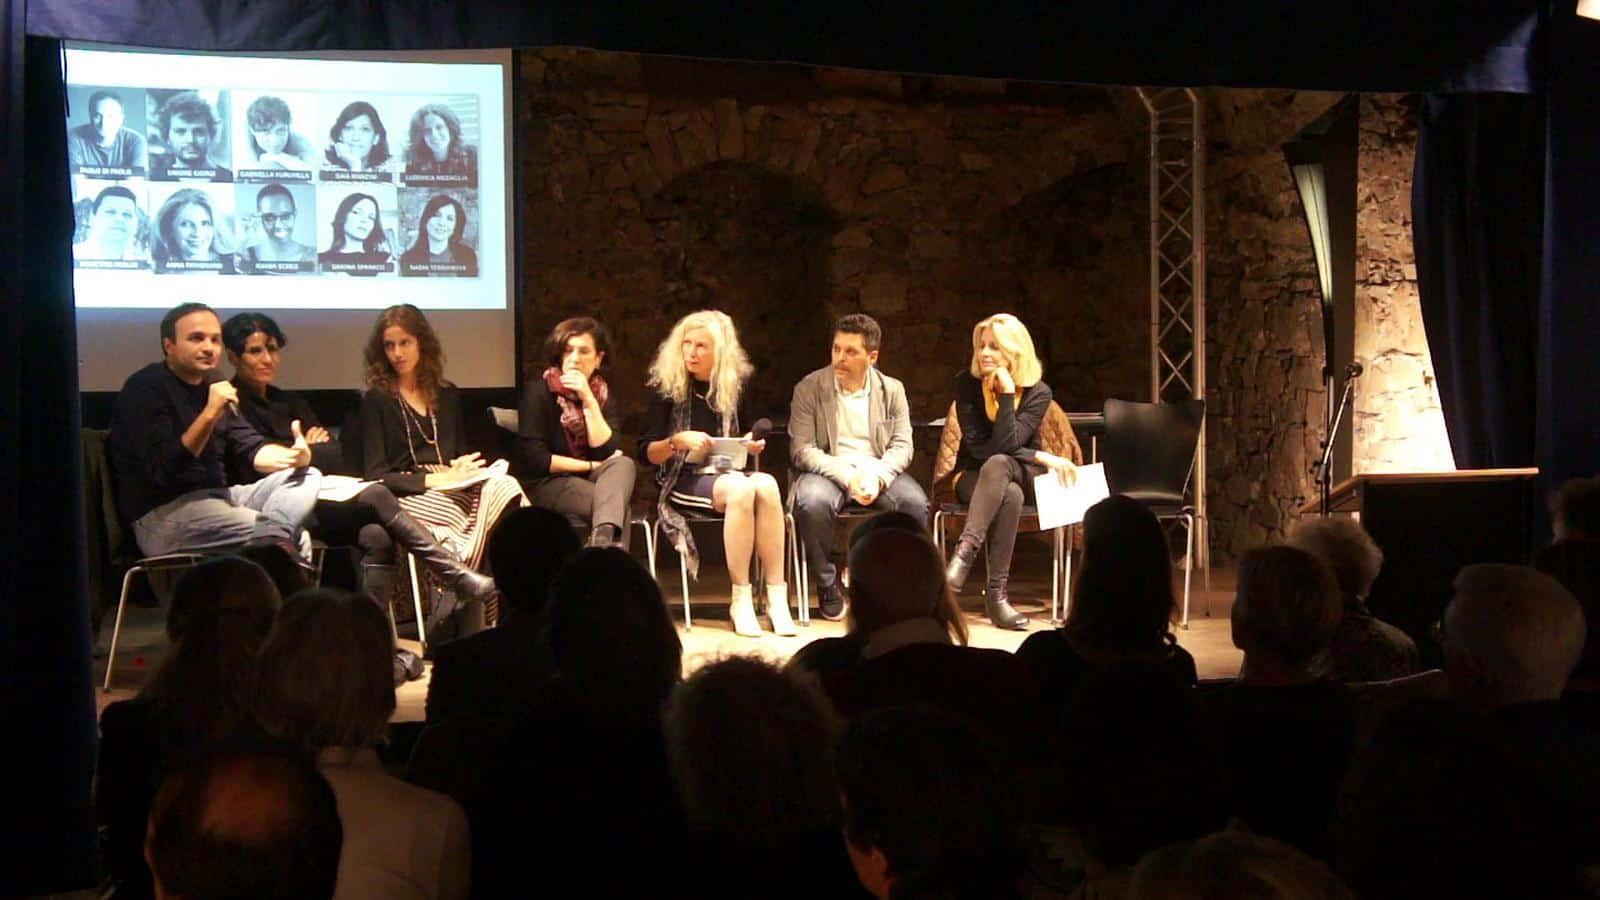 Paolo Di Paolo spricht über das Thema Identität